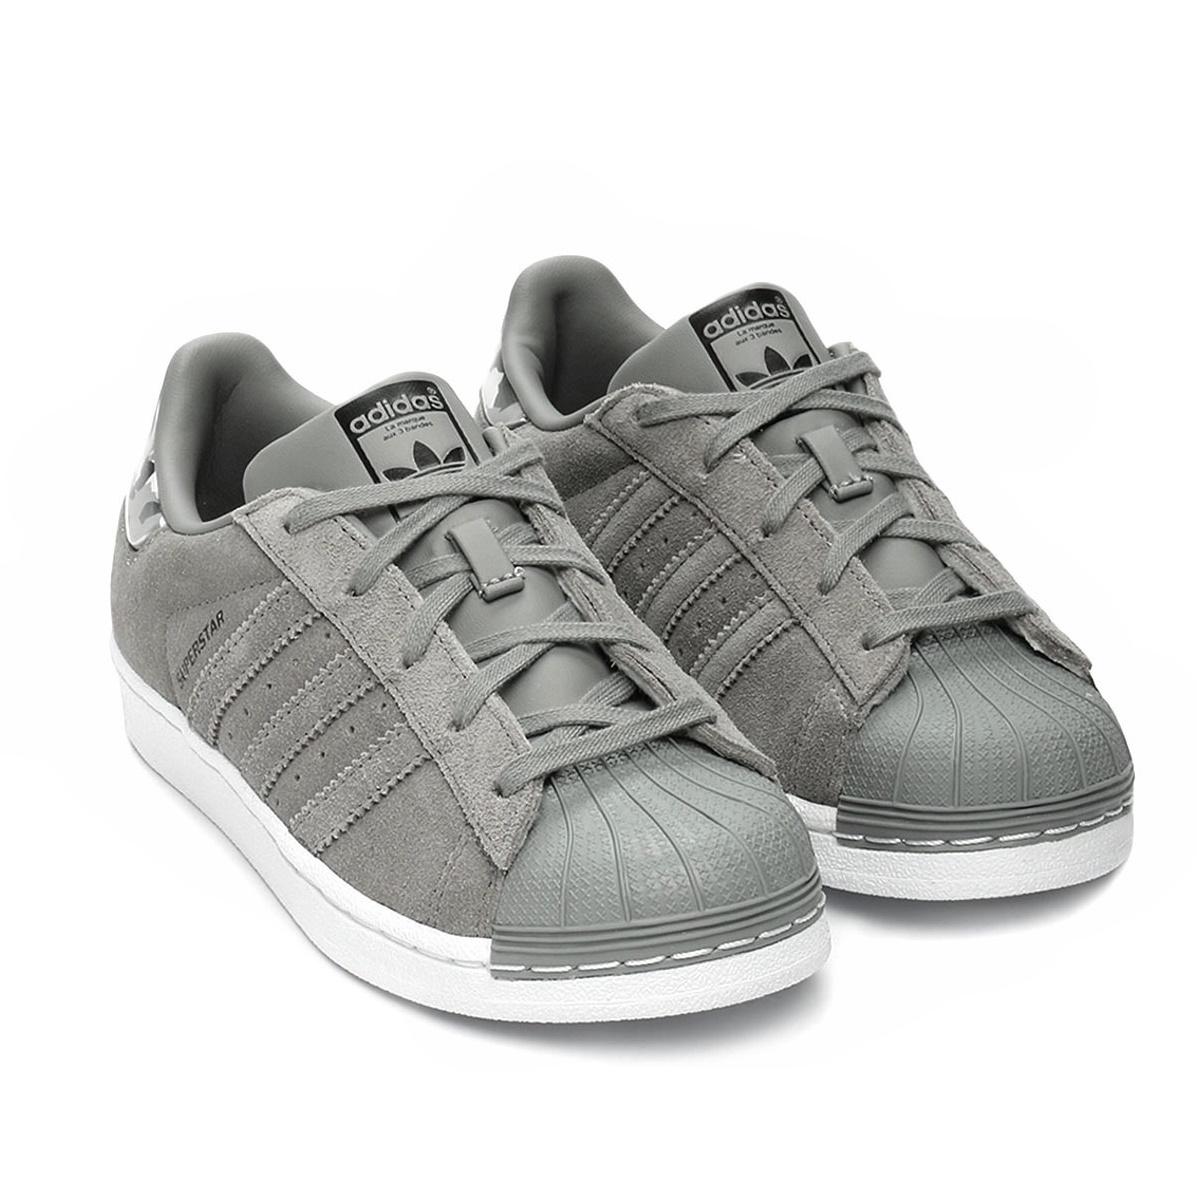 Adidas Originals Junior Superstar